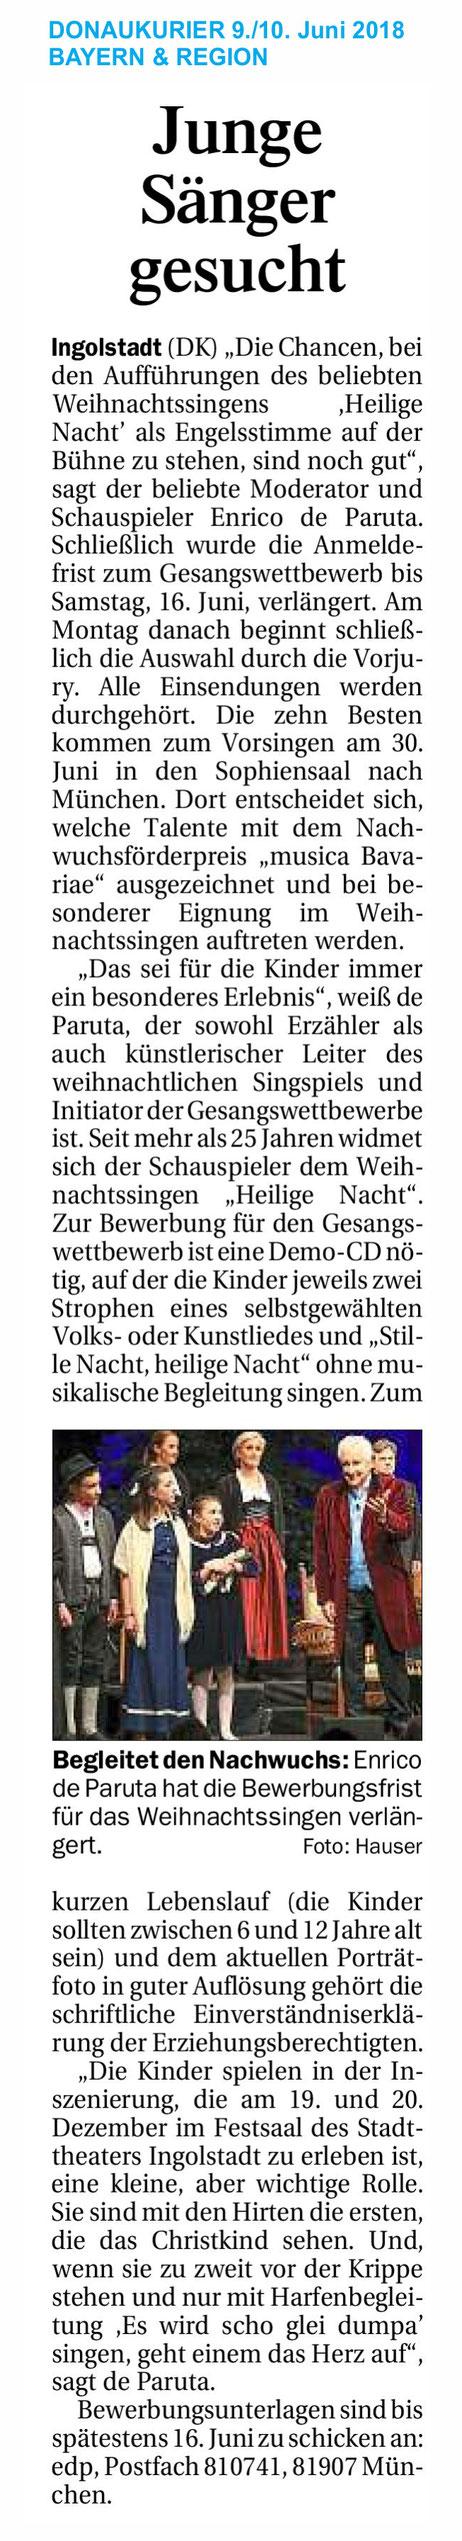 Donaukurier vom 9./10.6.2018